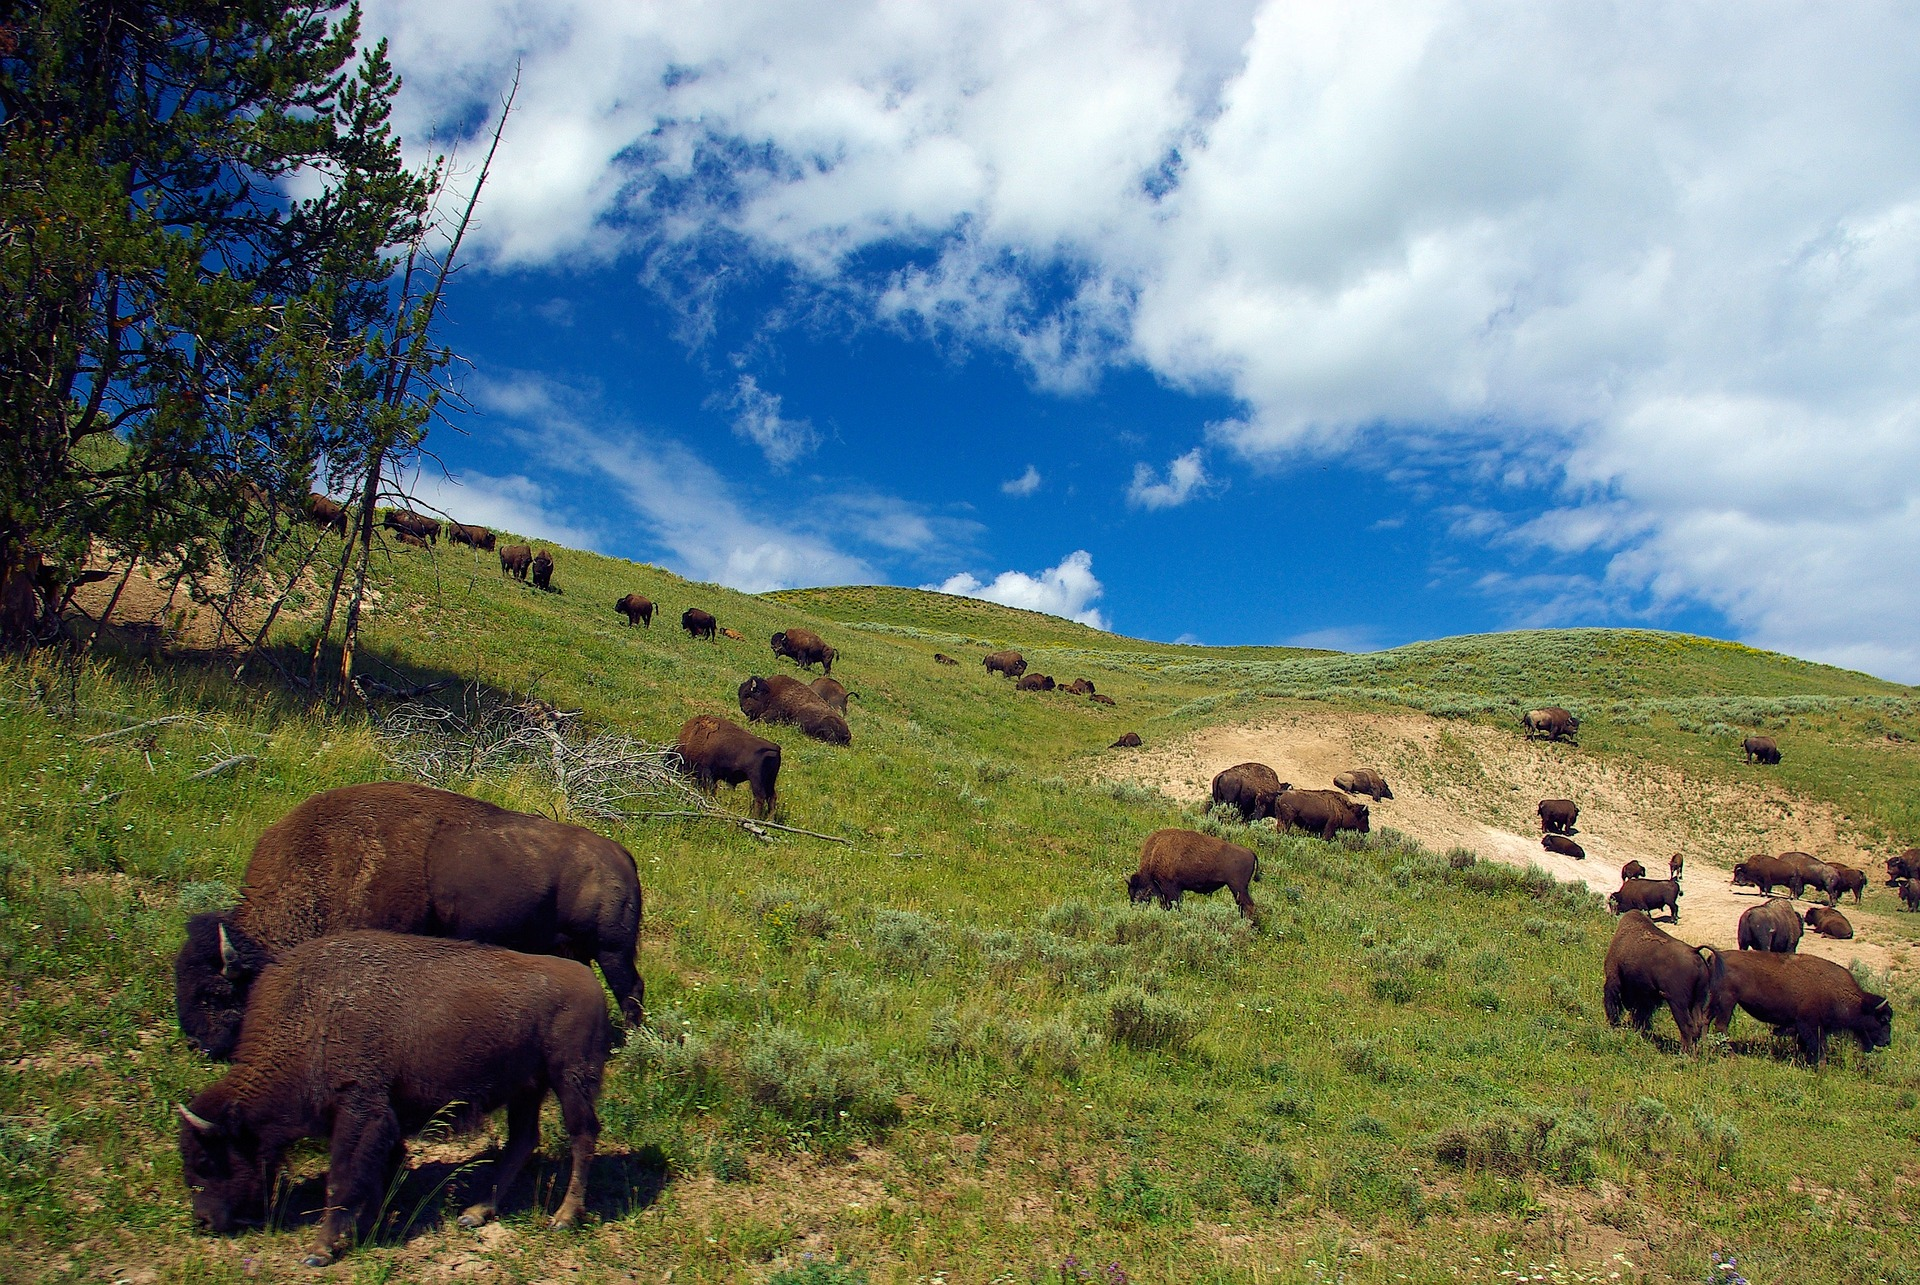 Buffalo grazing on a hillside.